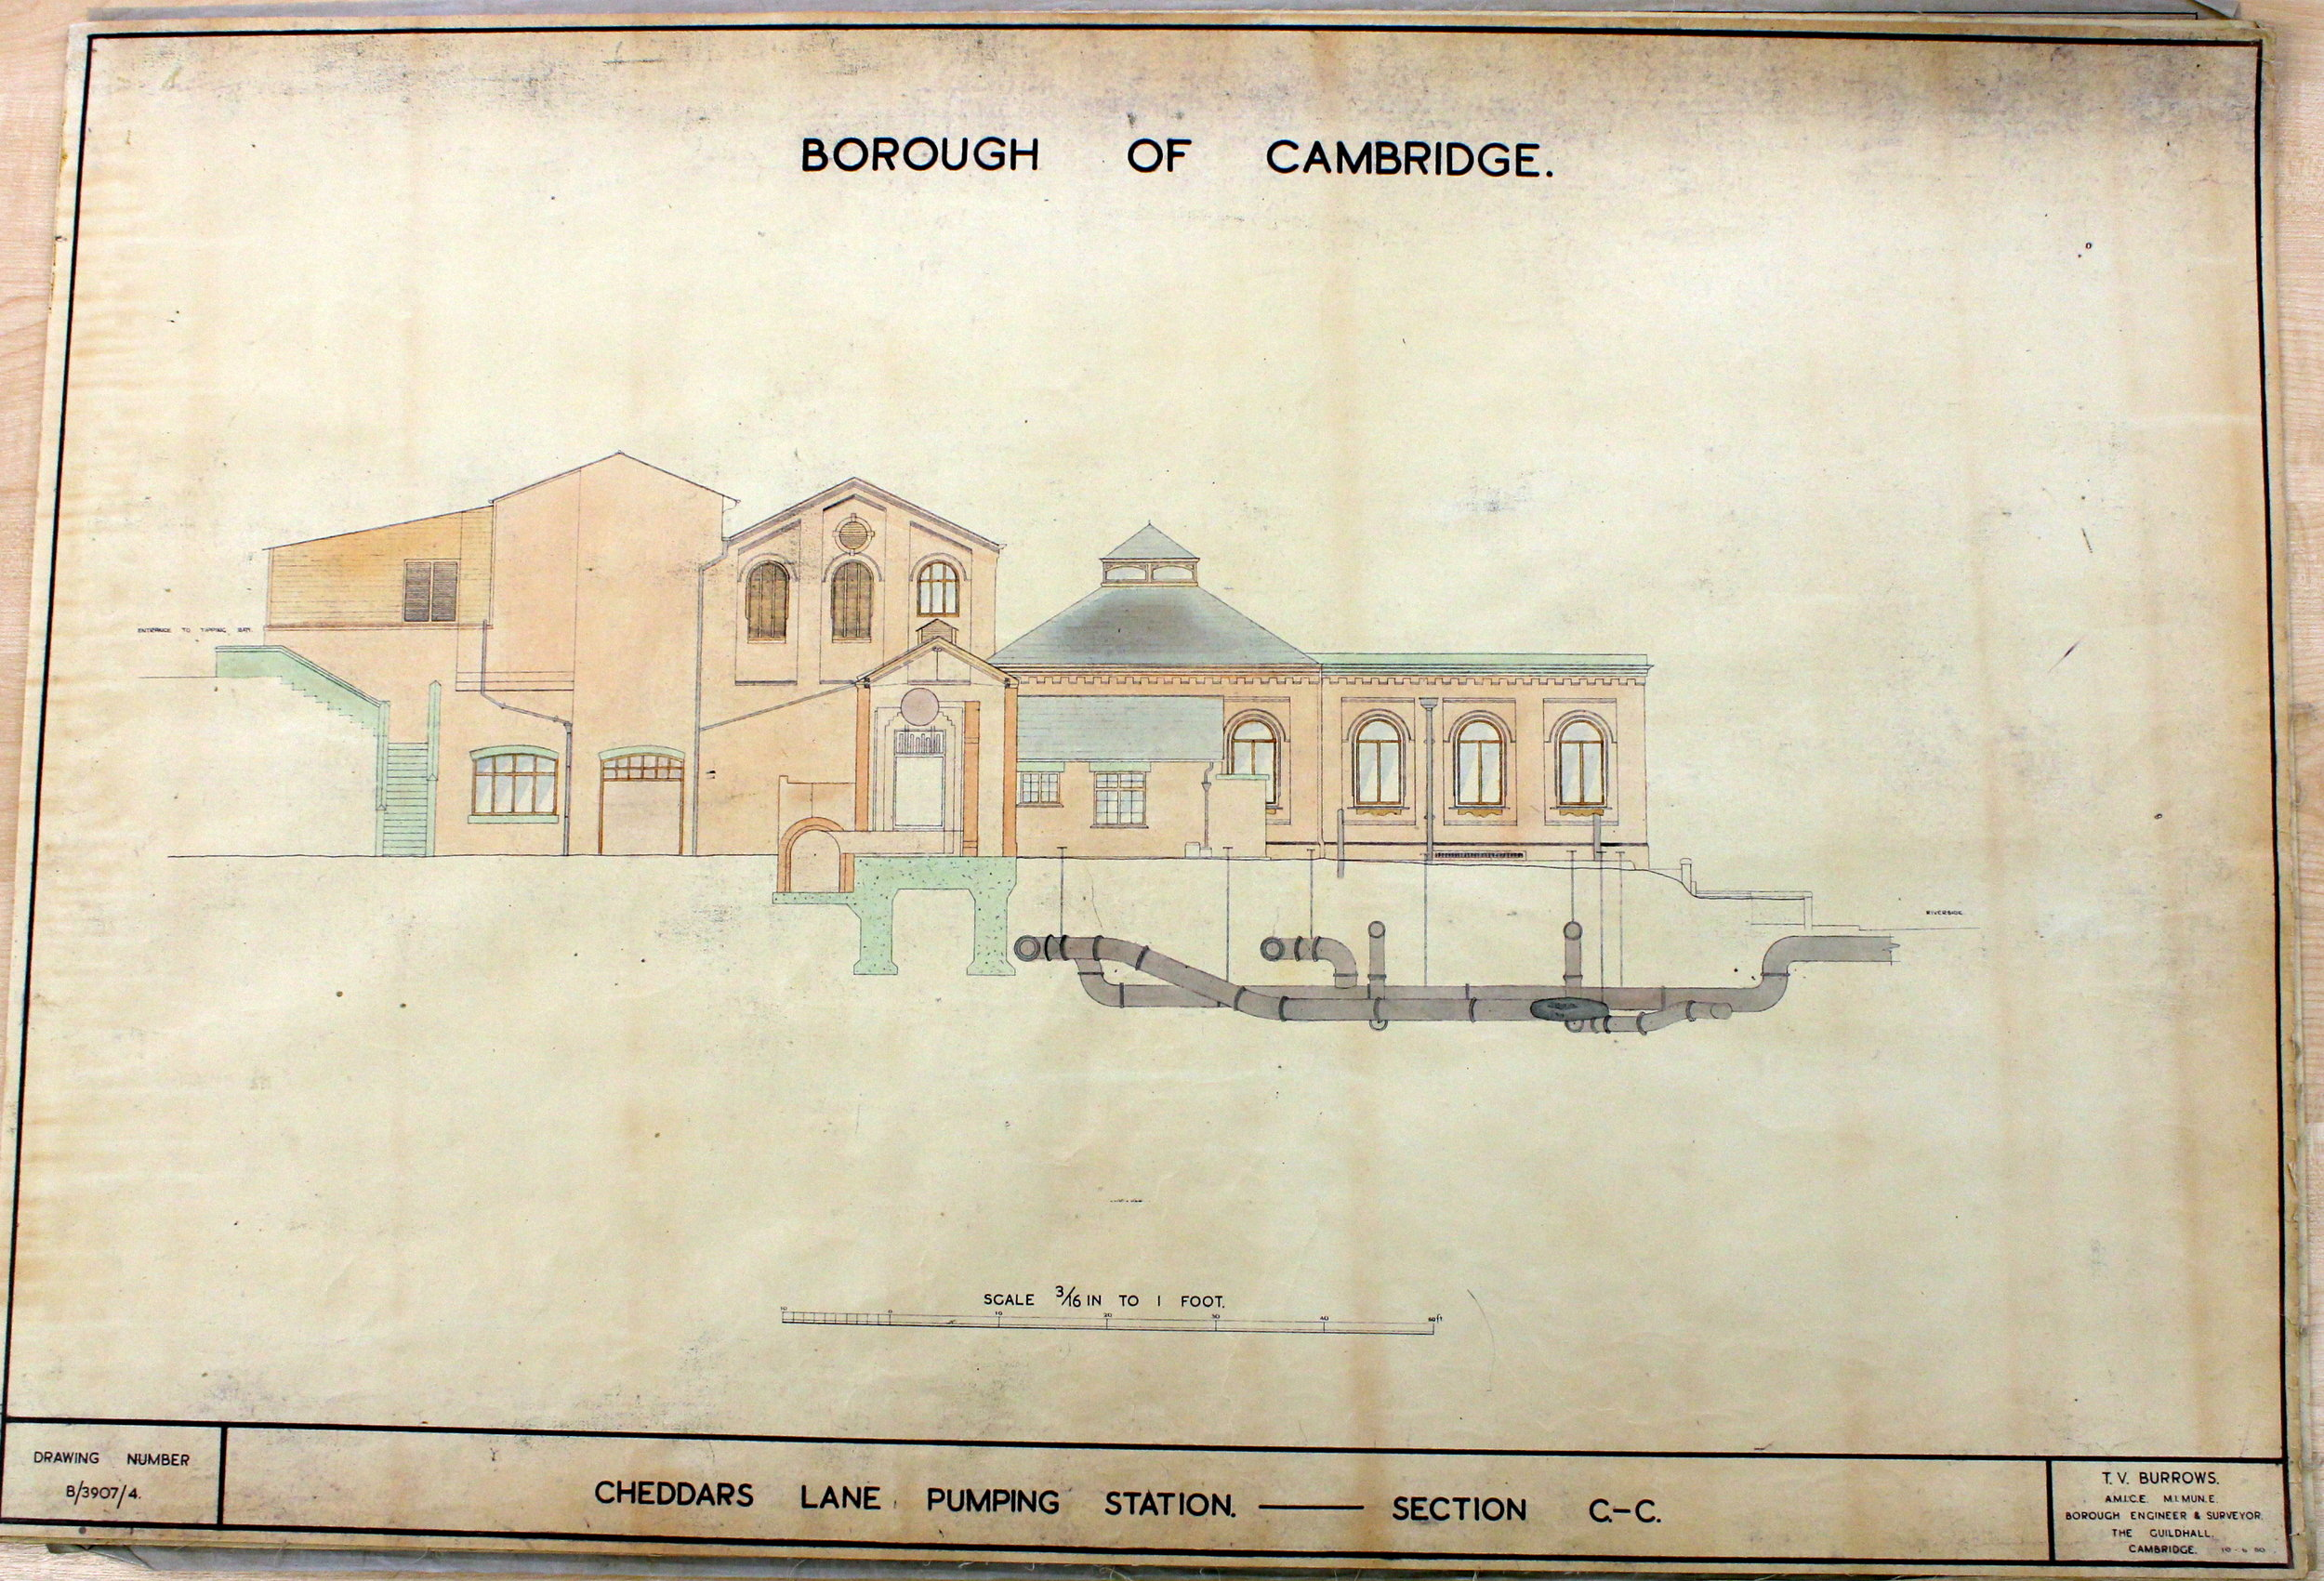 Borough_of_Cambridge_pumping_station_underground_section_architects_plan.JPG